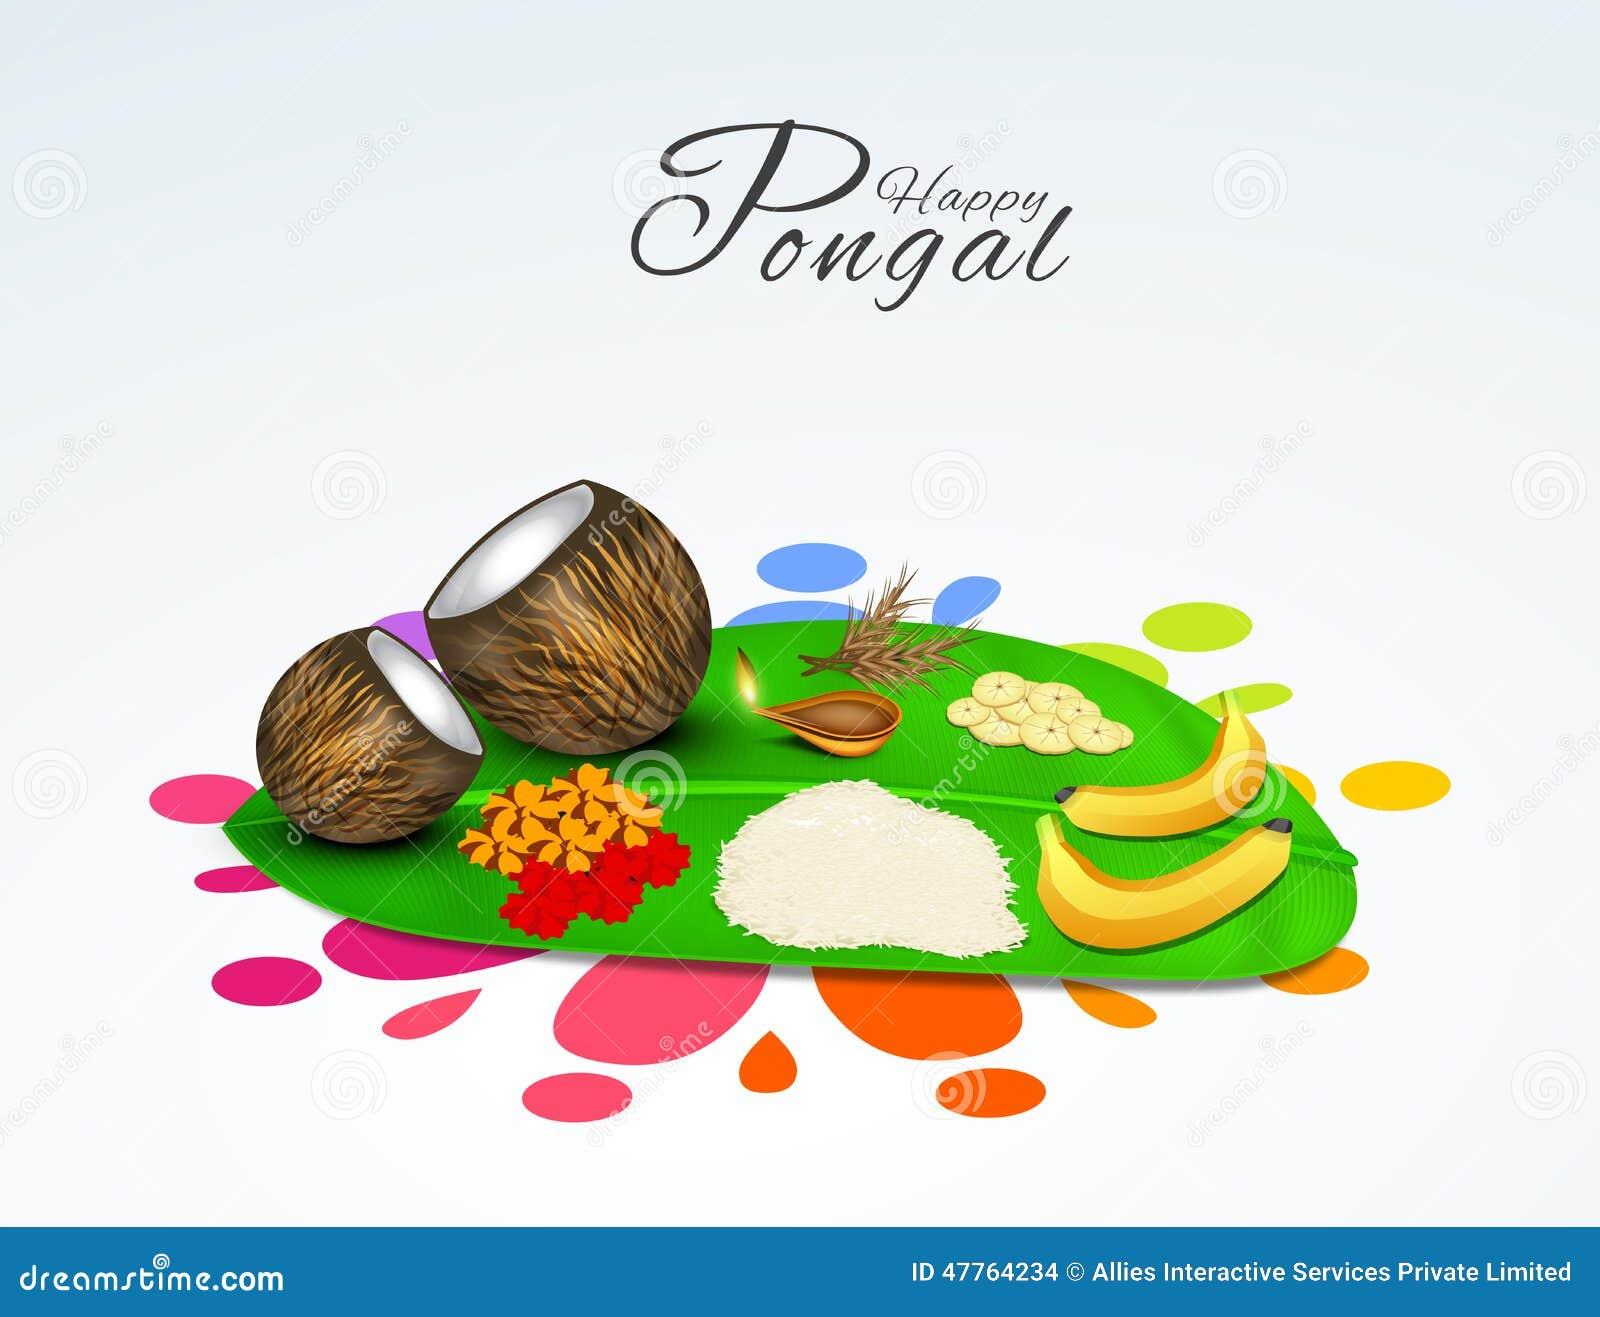 South Indian Festival Happy Pongal Celebrations Concept